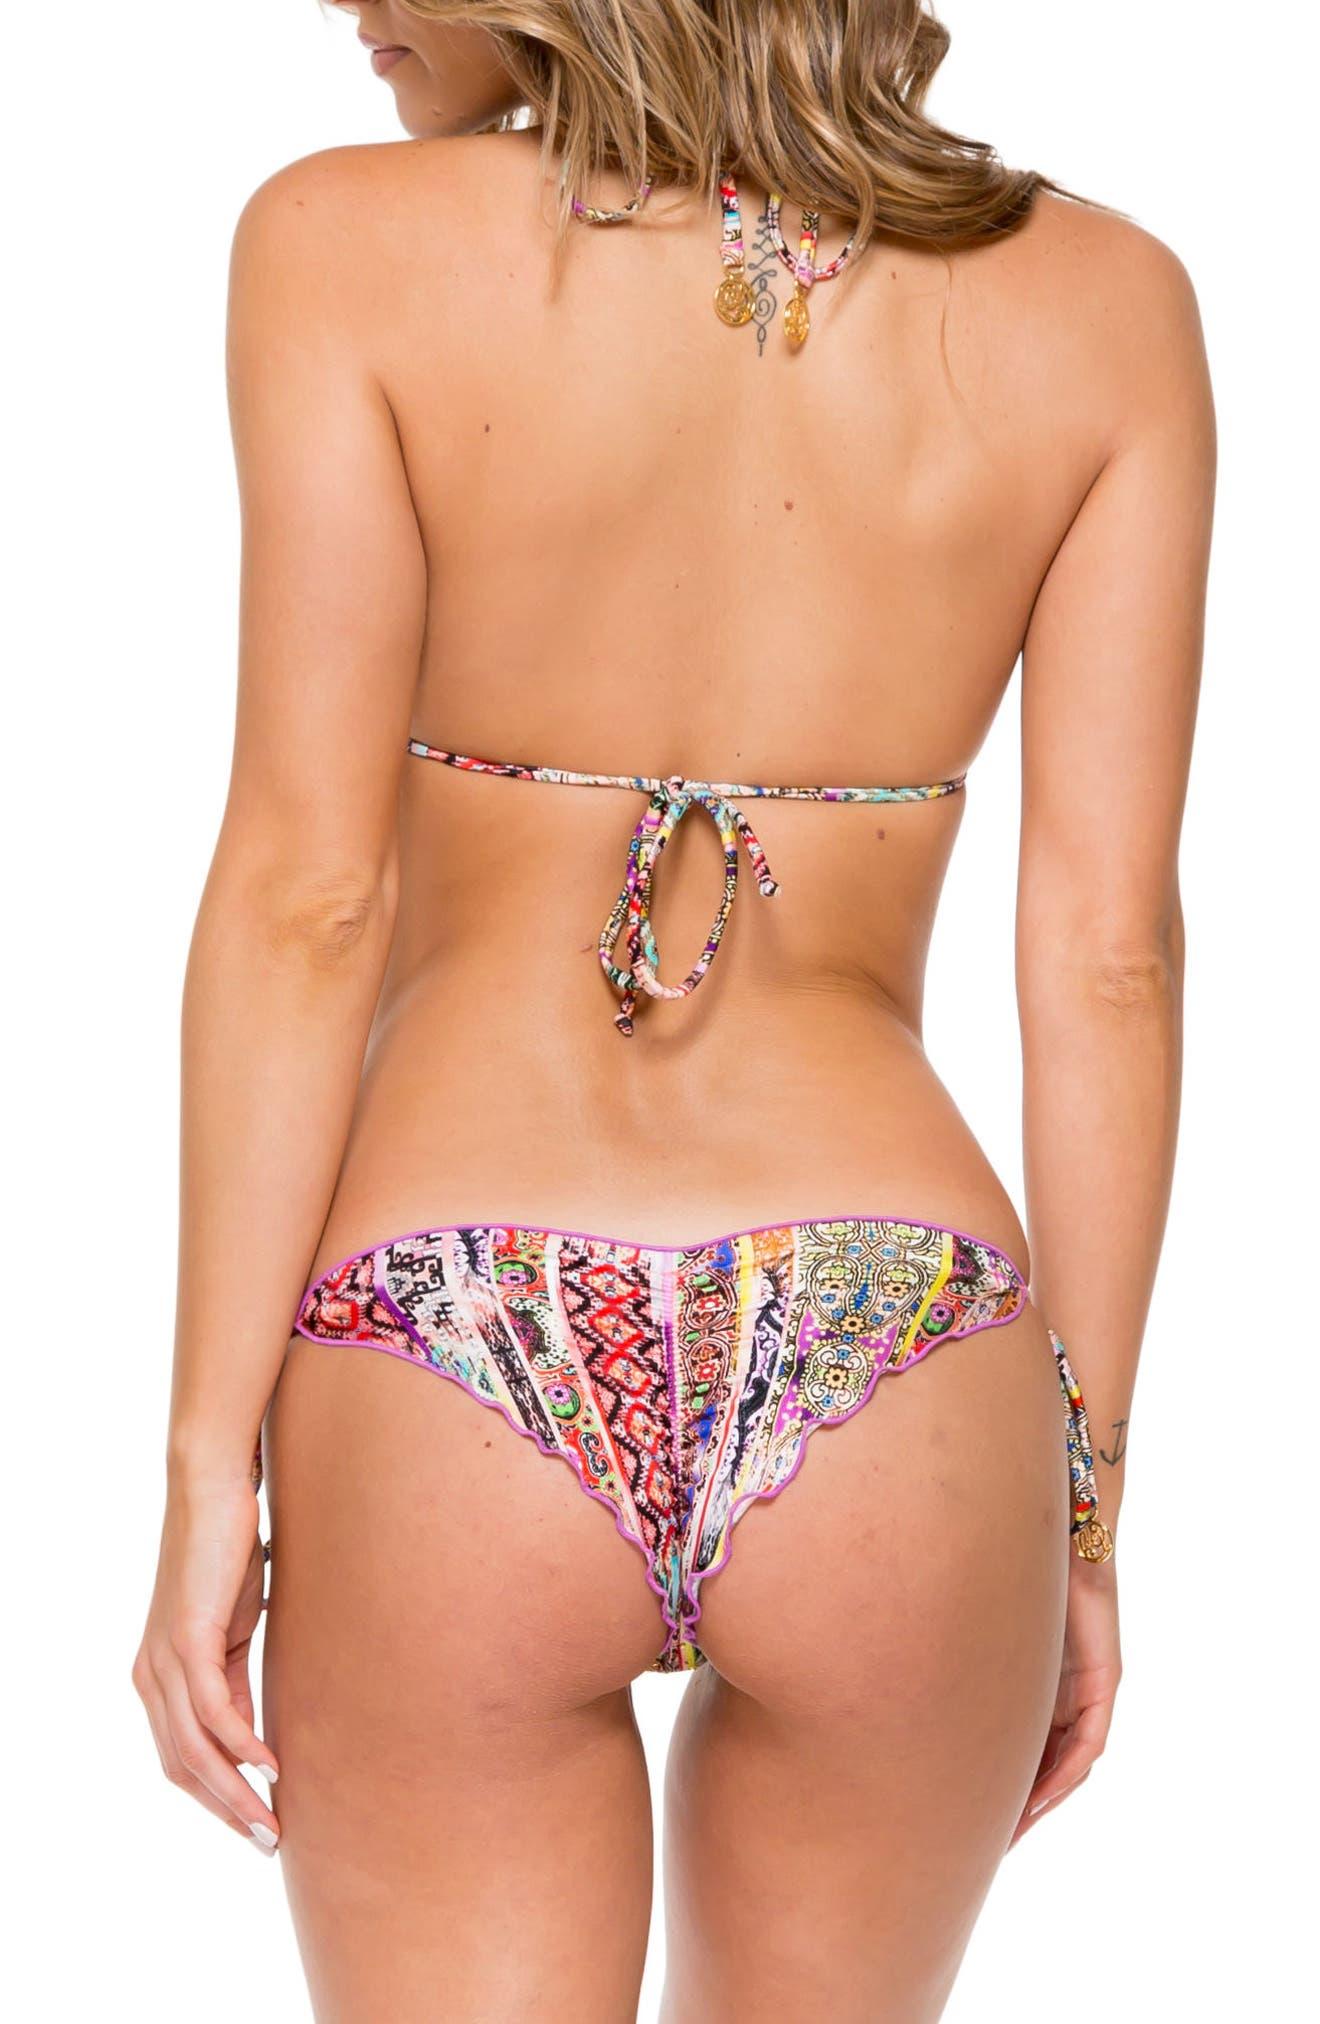 Embellished Brazilian Bikini Bottoms,                             Alternate thumbnail 7, color,                             800